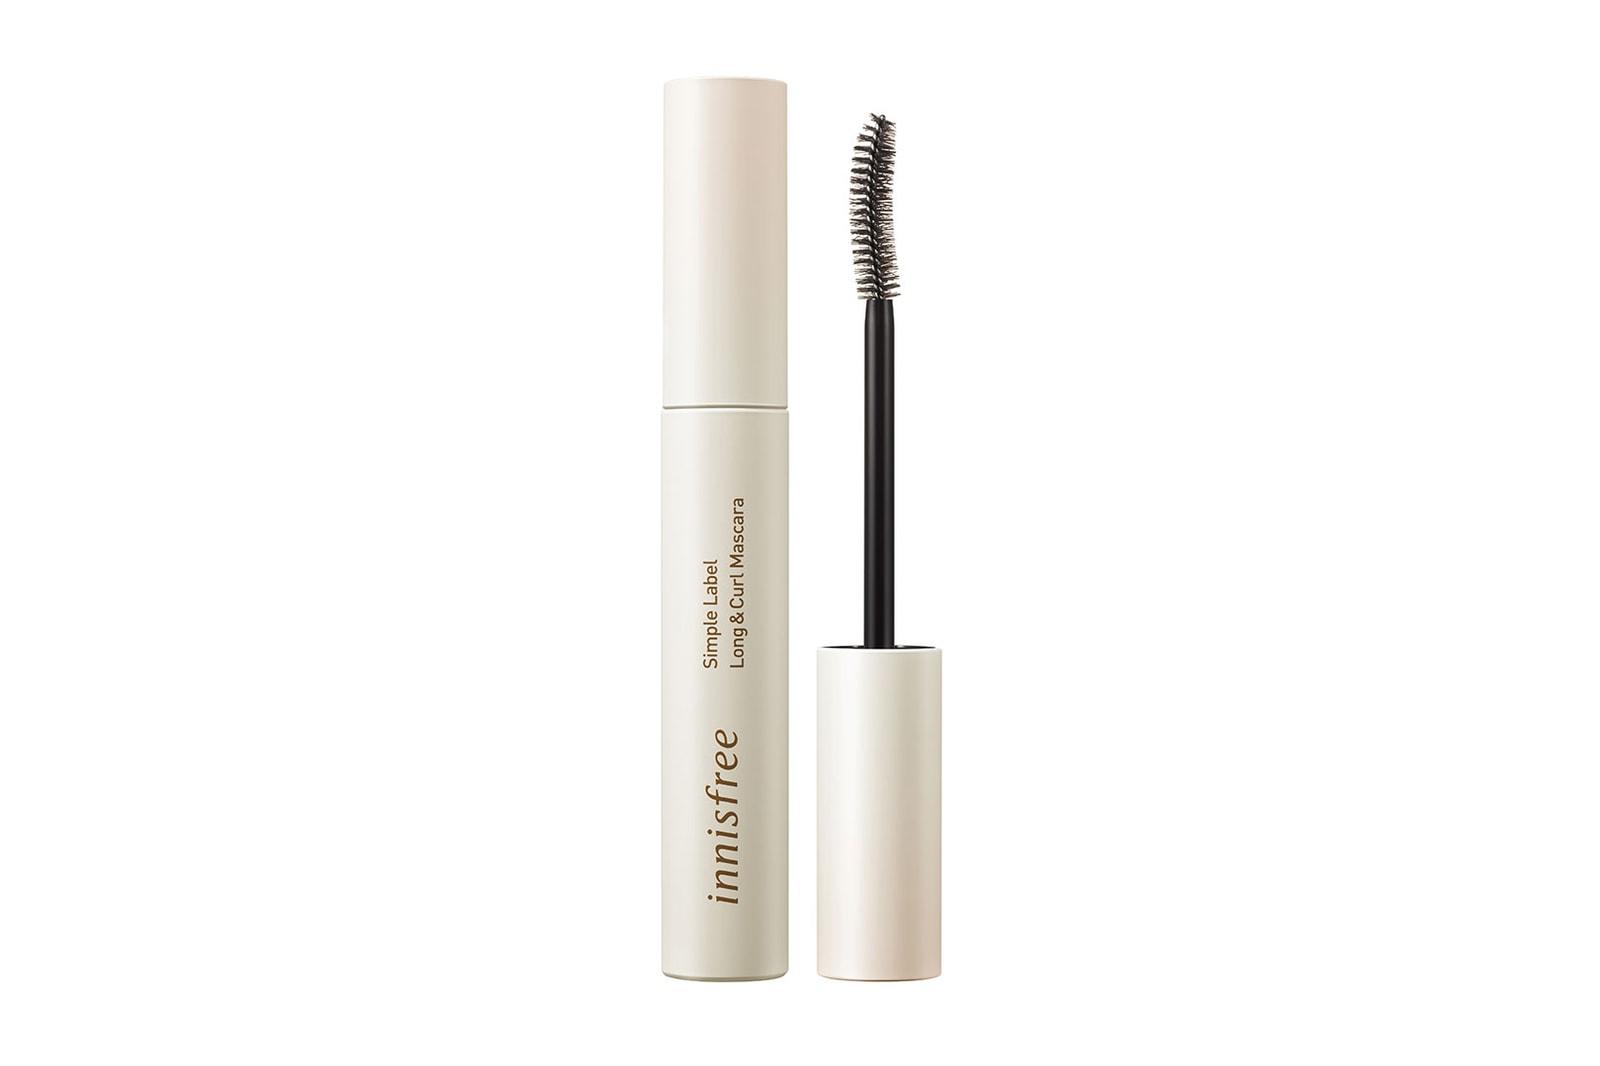 innisfree vegan makeup simple label collection color lip balm tinted moisturizer mascara